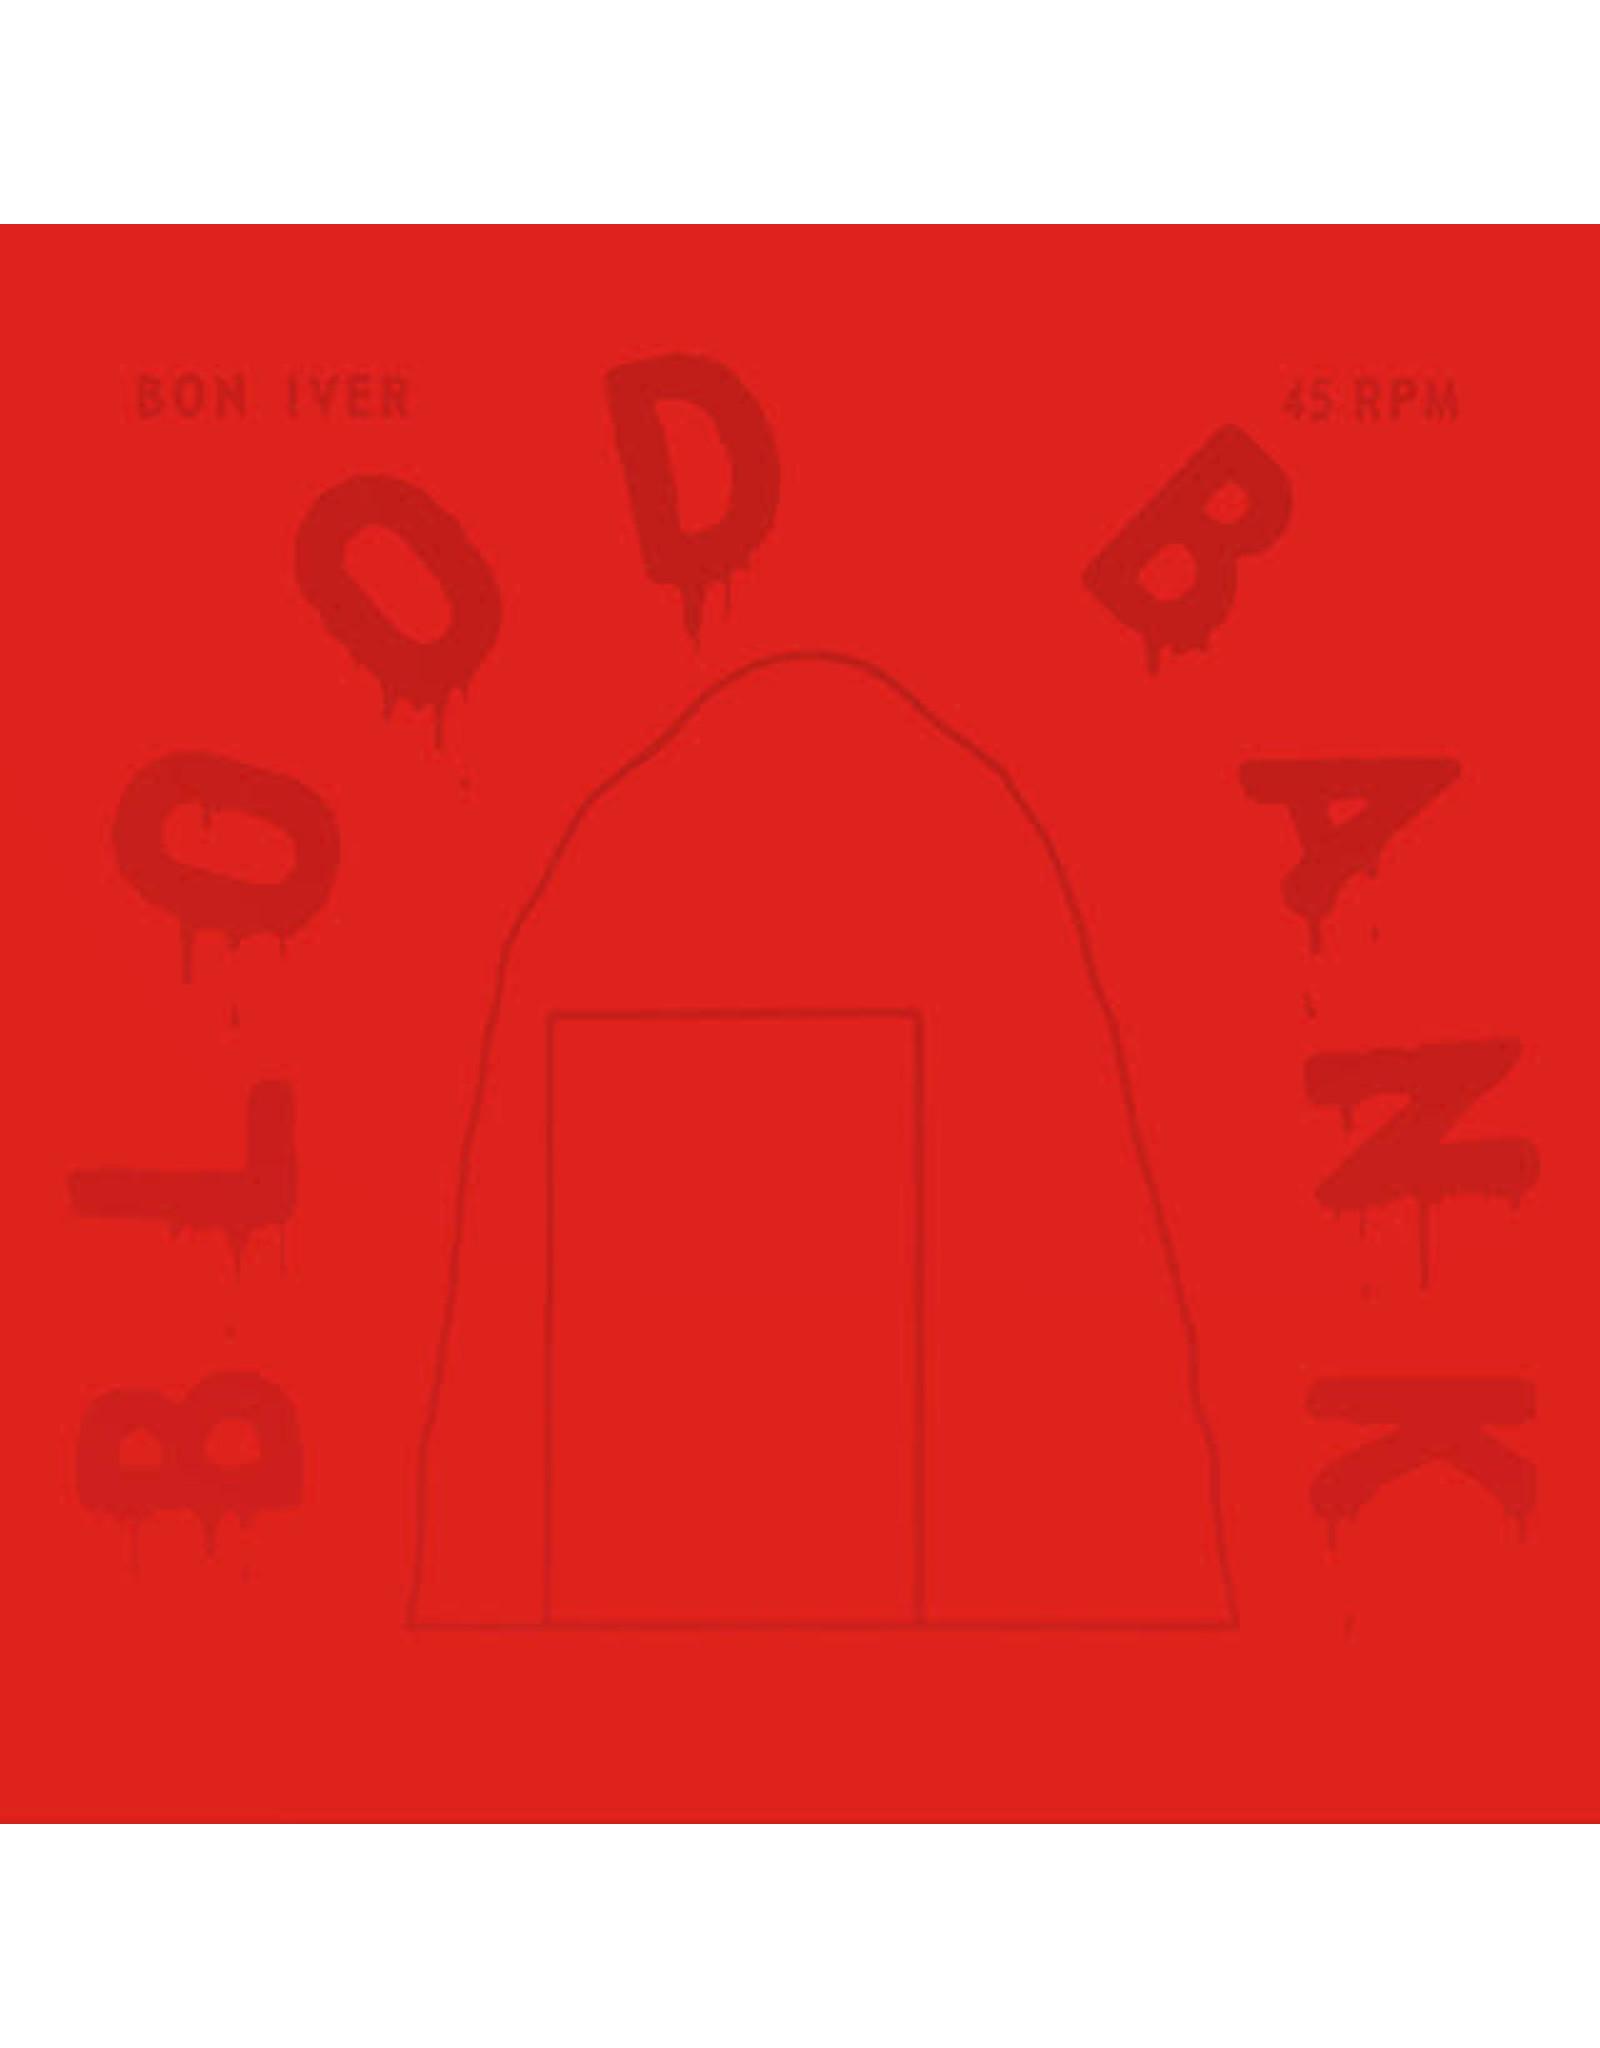 Vinyl Bon Iver - Blood Bank